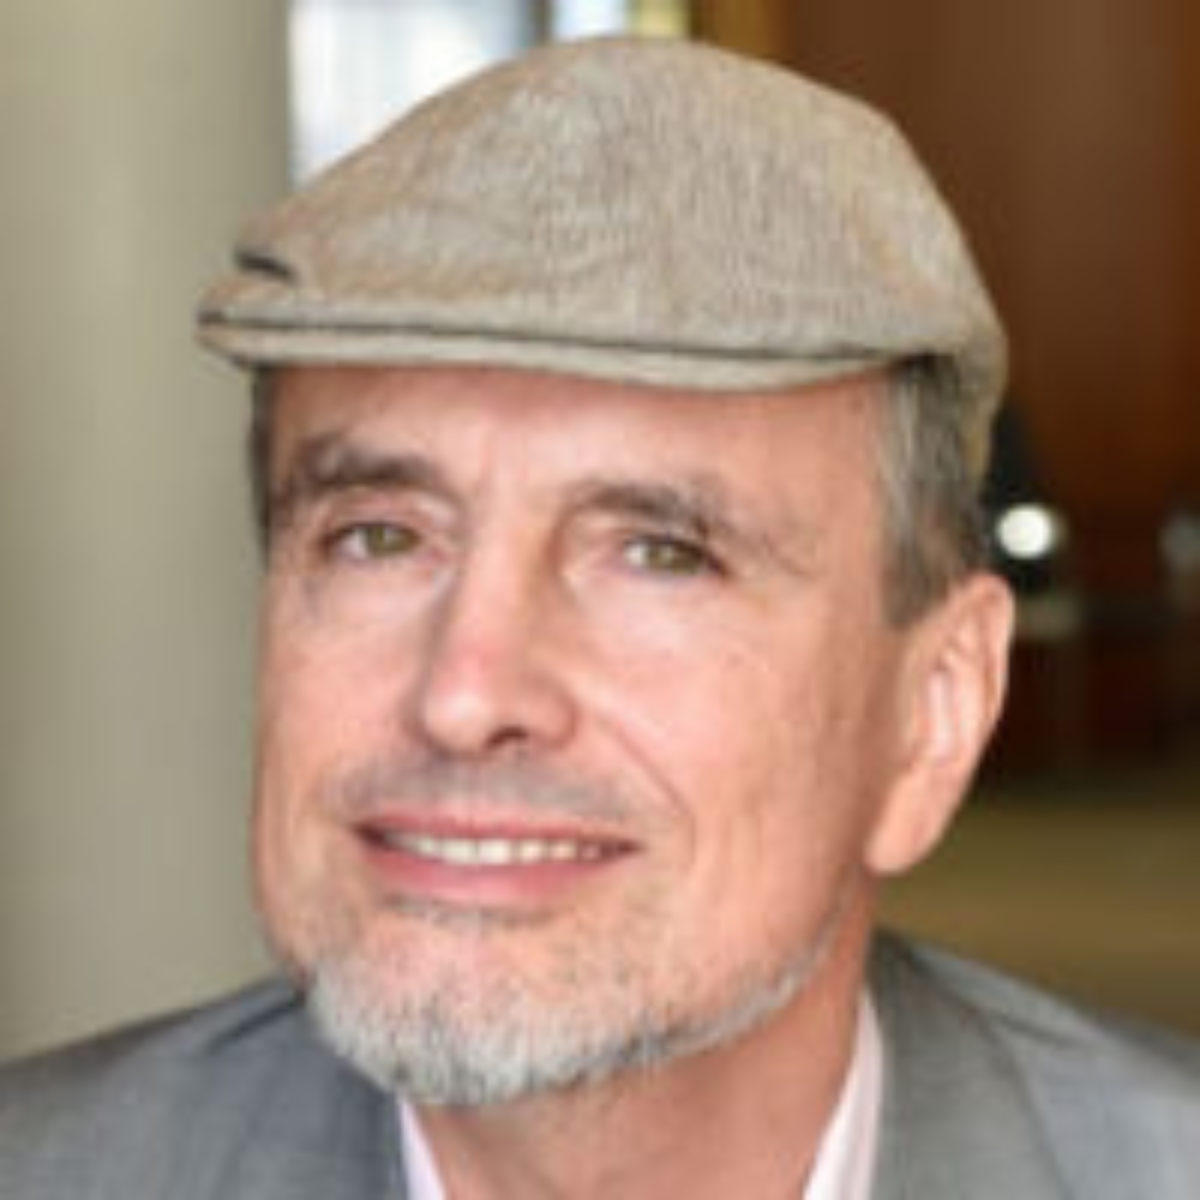 Jurgen Schmidhuber Father Of Artificial Intelligence By Promotivate